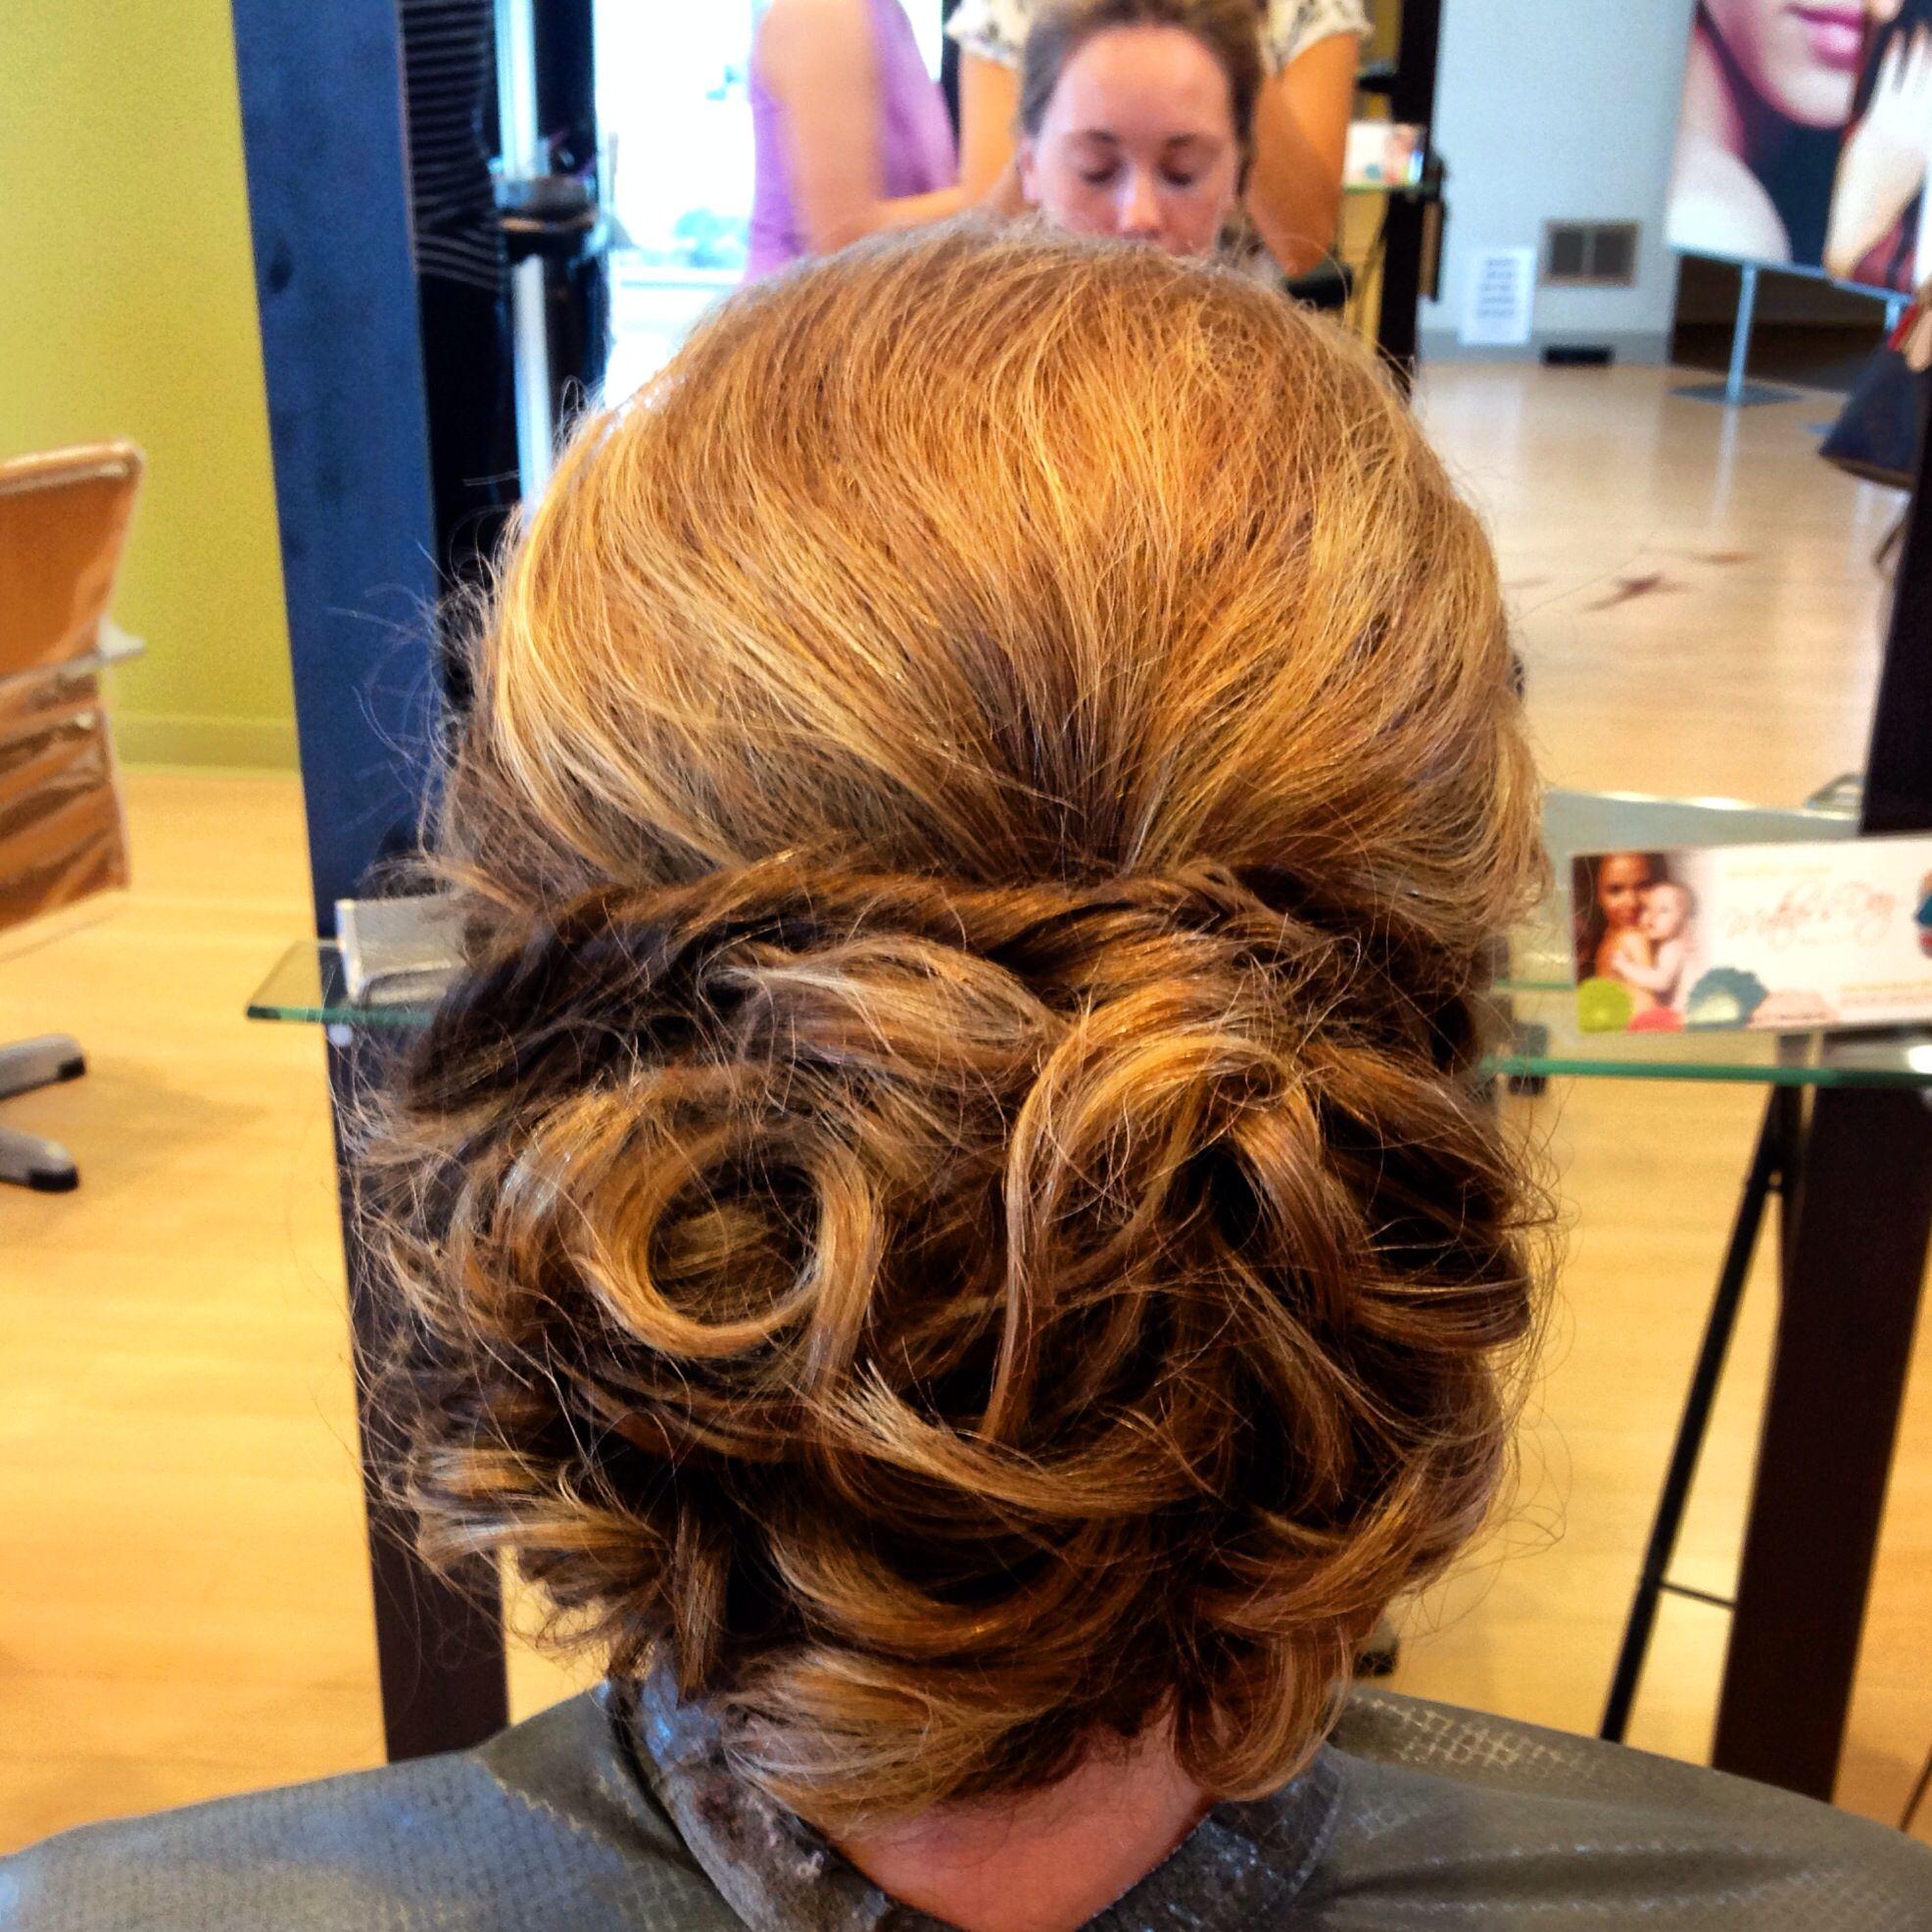 Pin by Jamie Starr on Work::. | Low bun updo, Wedding ...